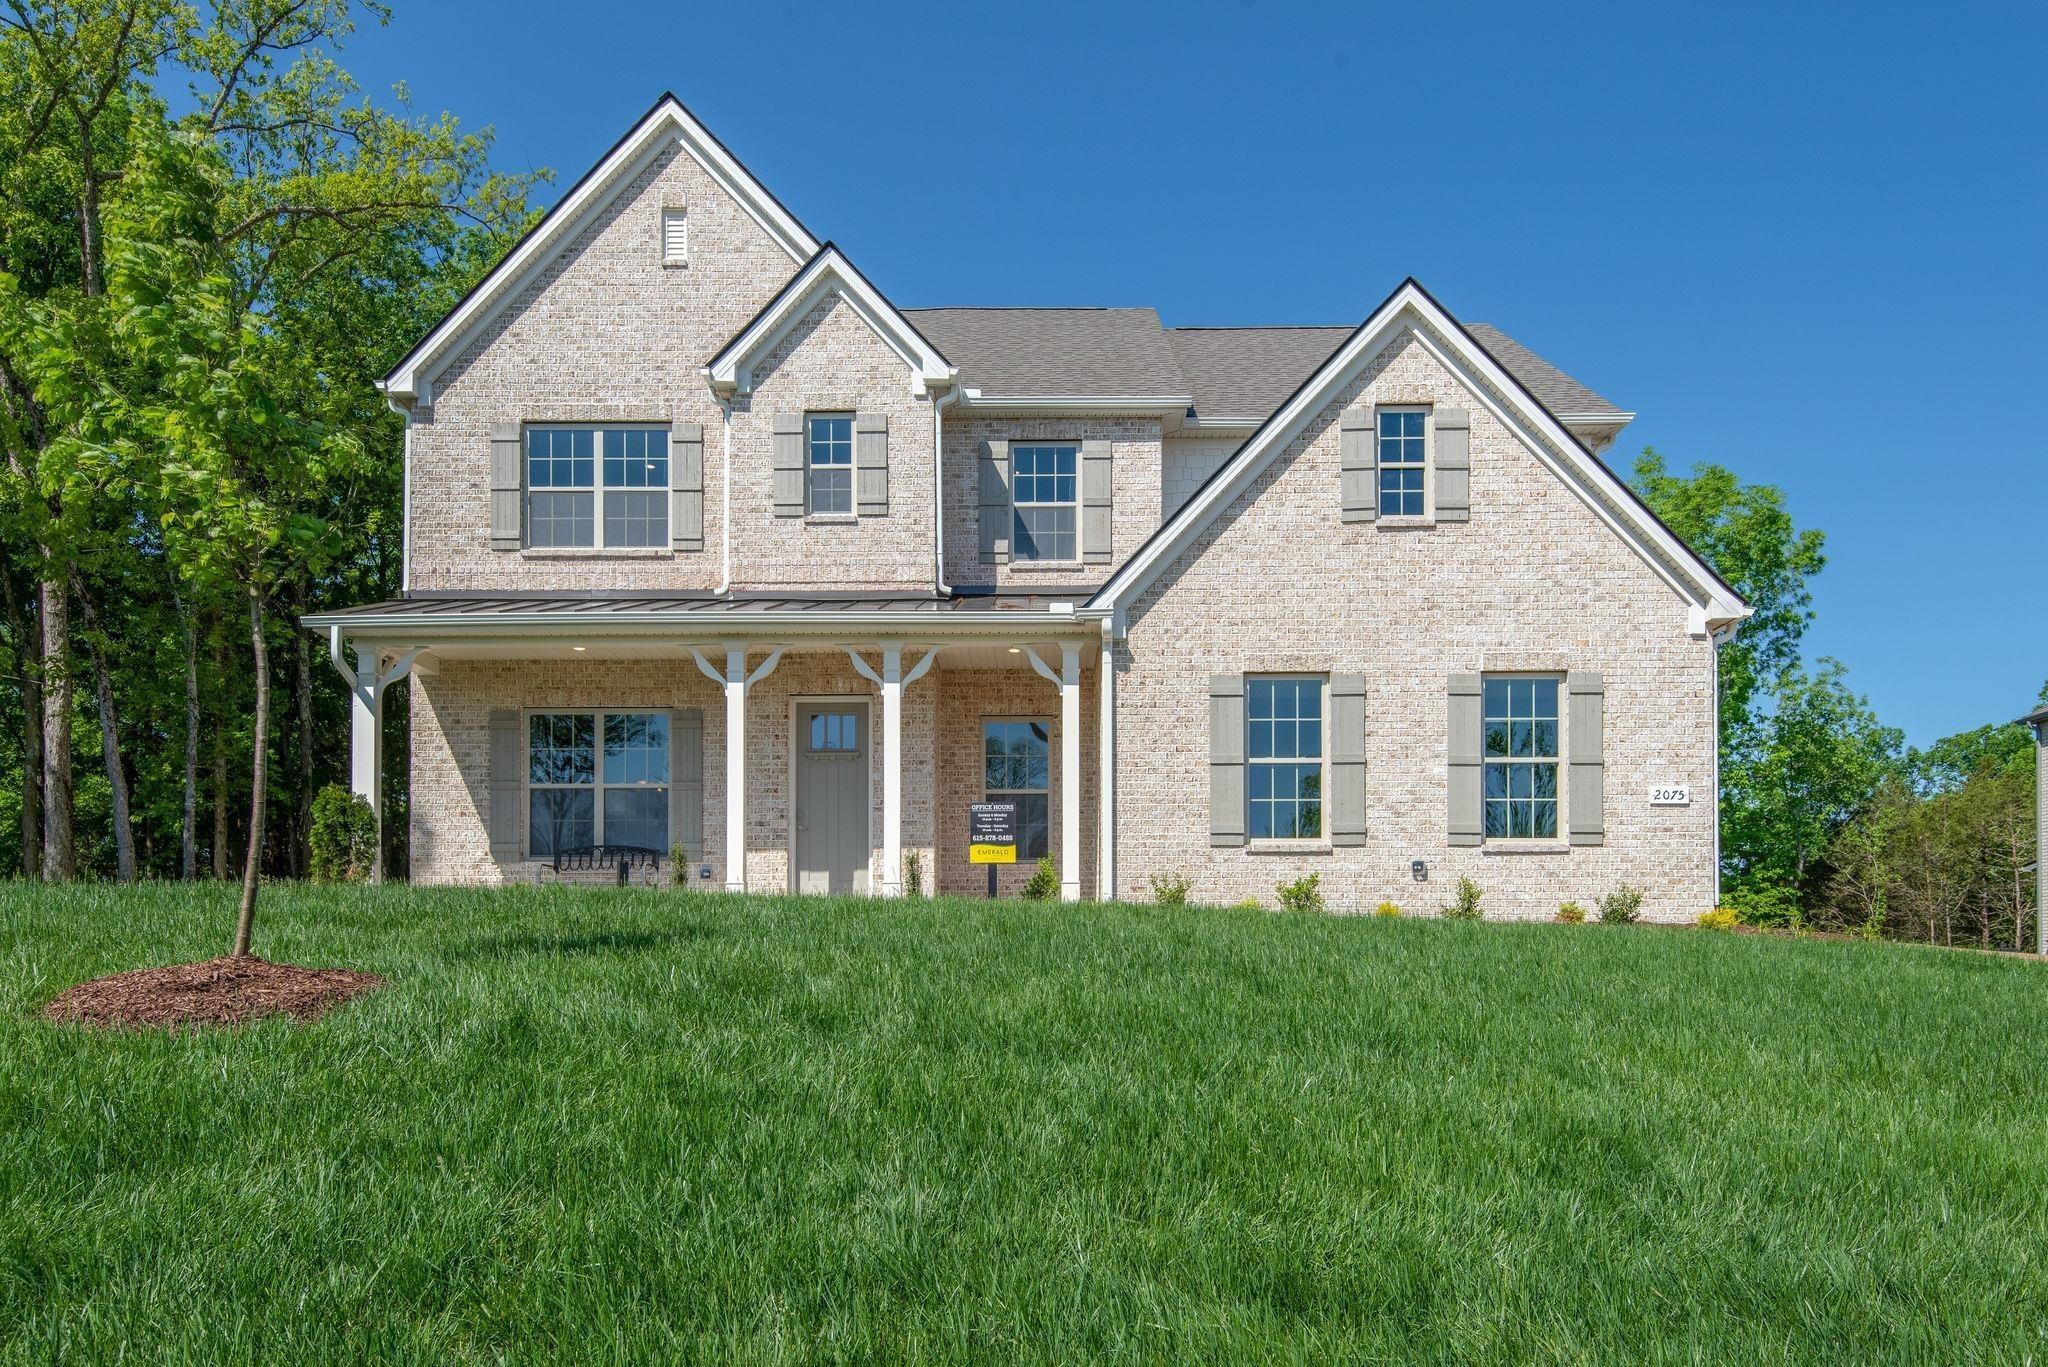 2075 Catalina Way / Model Home, Nolensville, TN 37135 - Nolensville, TN real estate listing